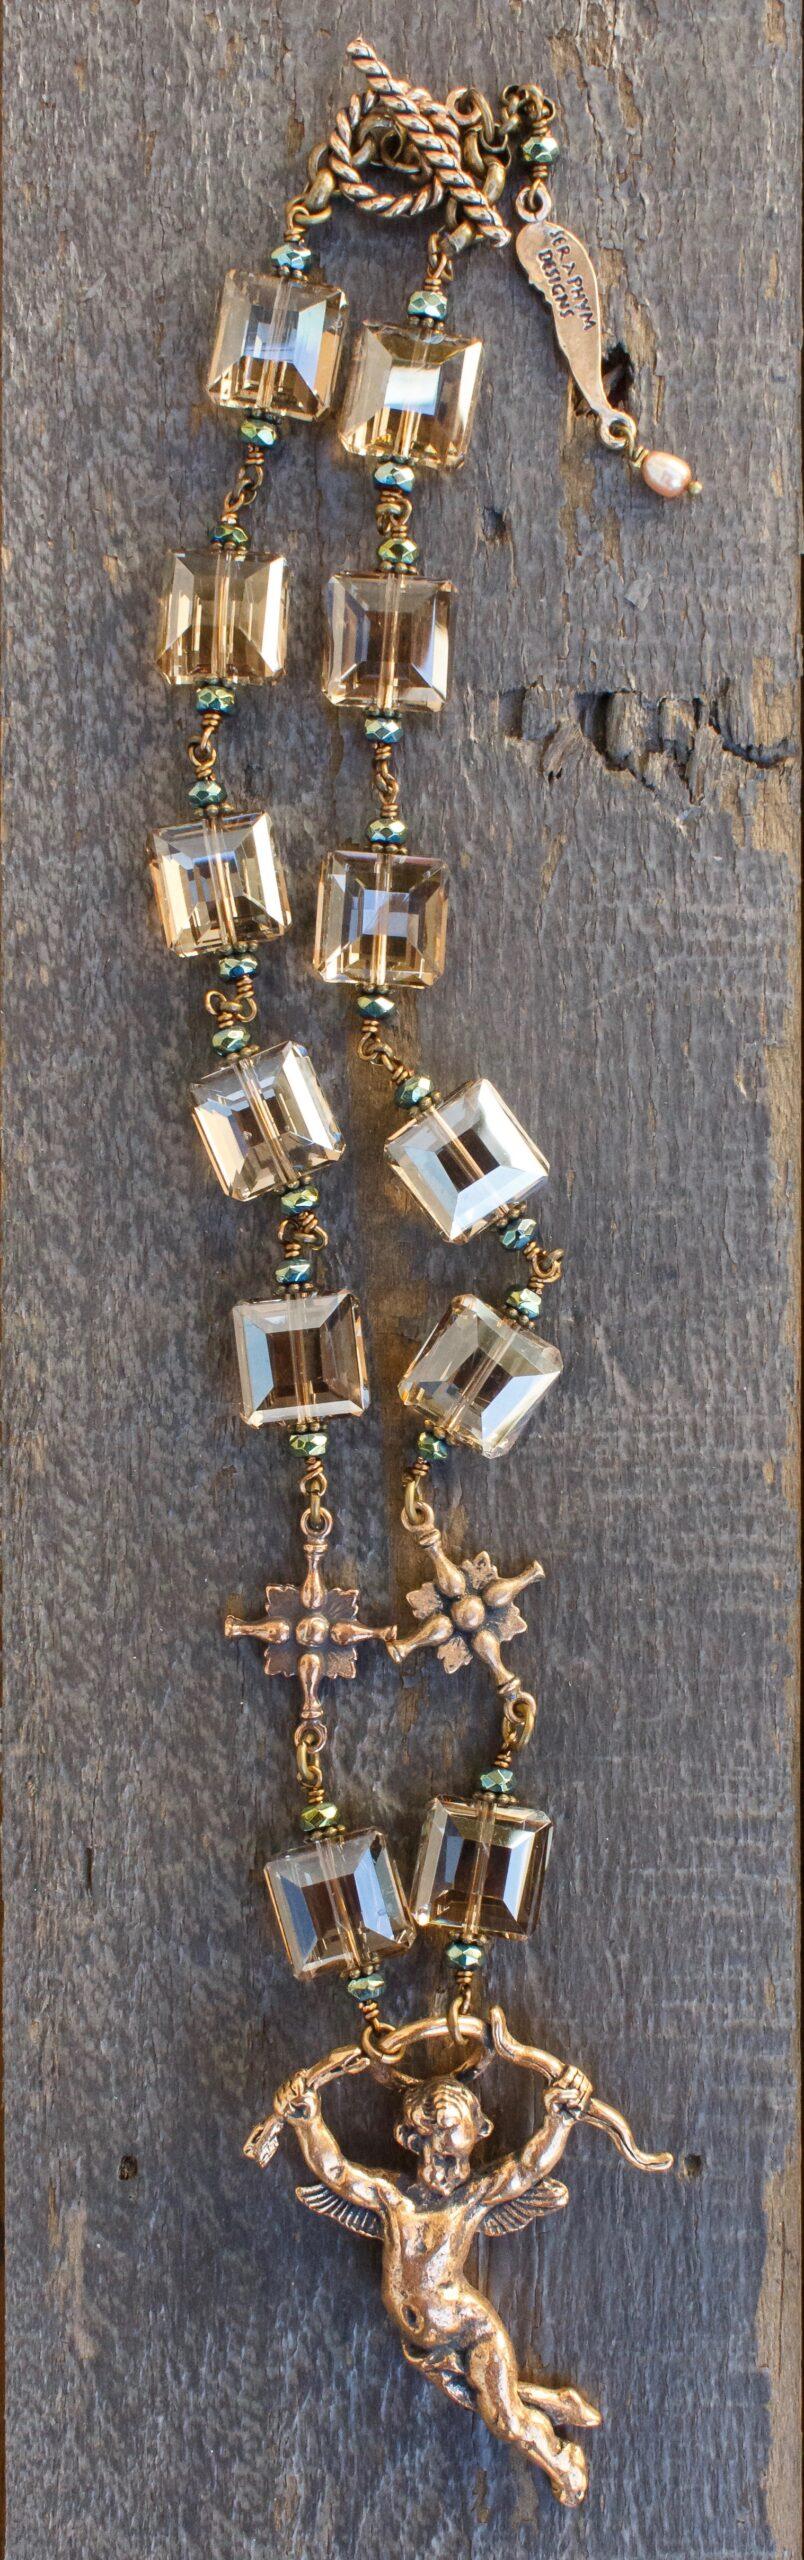 Champagne and Aqua Crystal Necklace – Cherub Angel 12mm